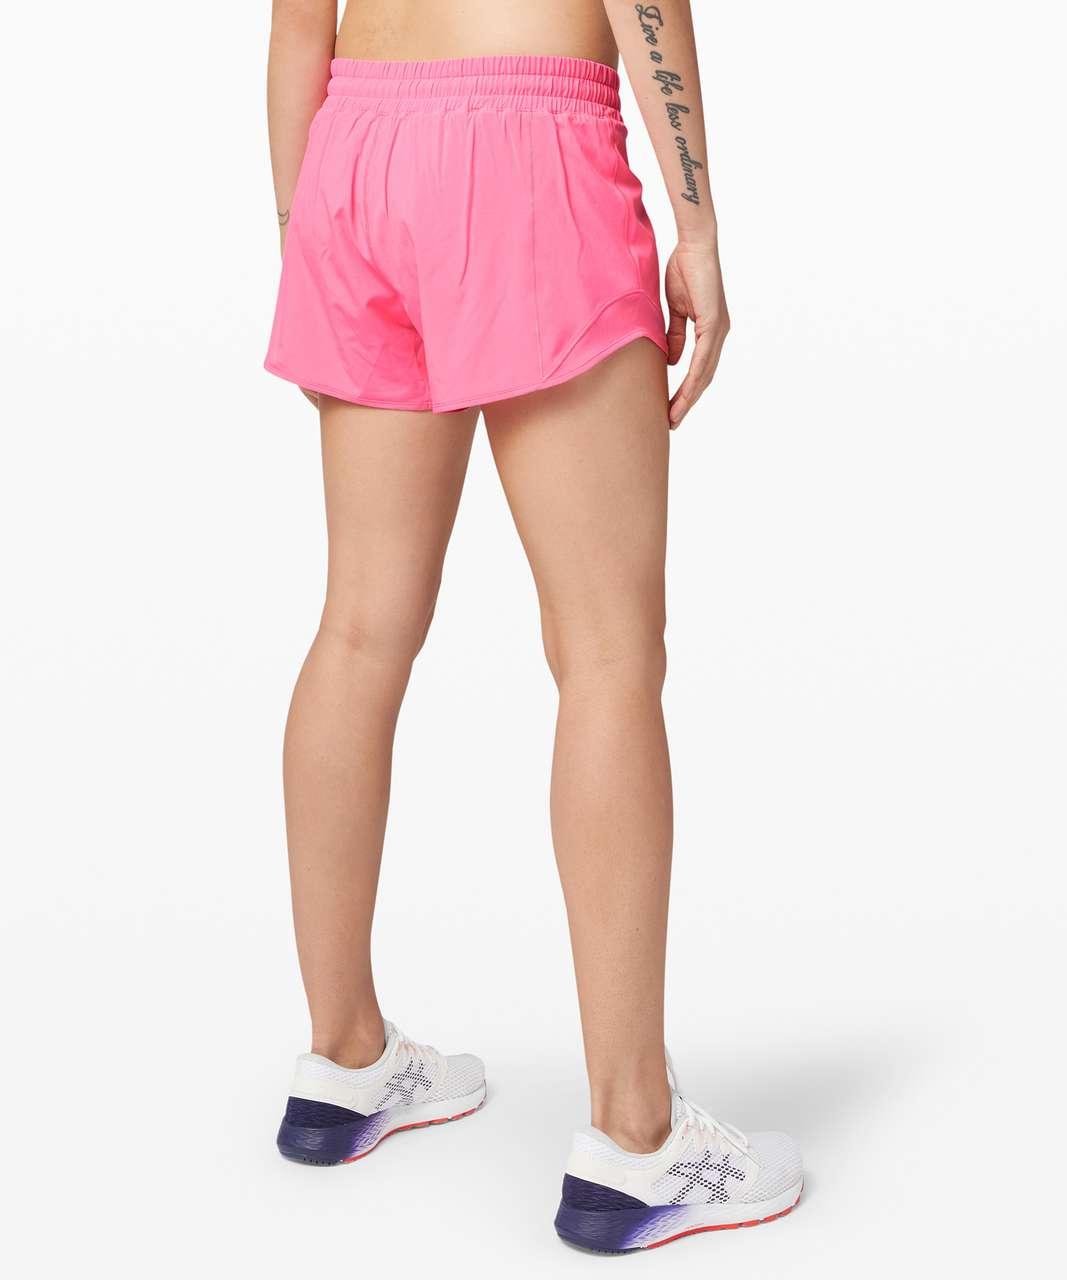 "Lululemon Hotty Hot Short II *Long 4"" - Dark Prism Pink"